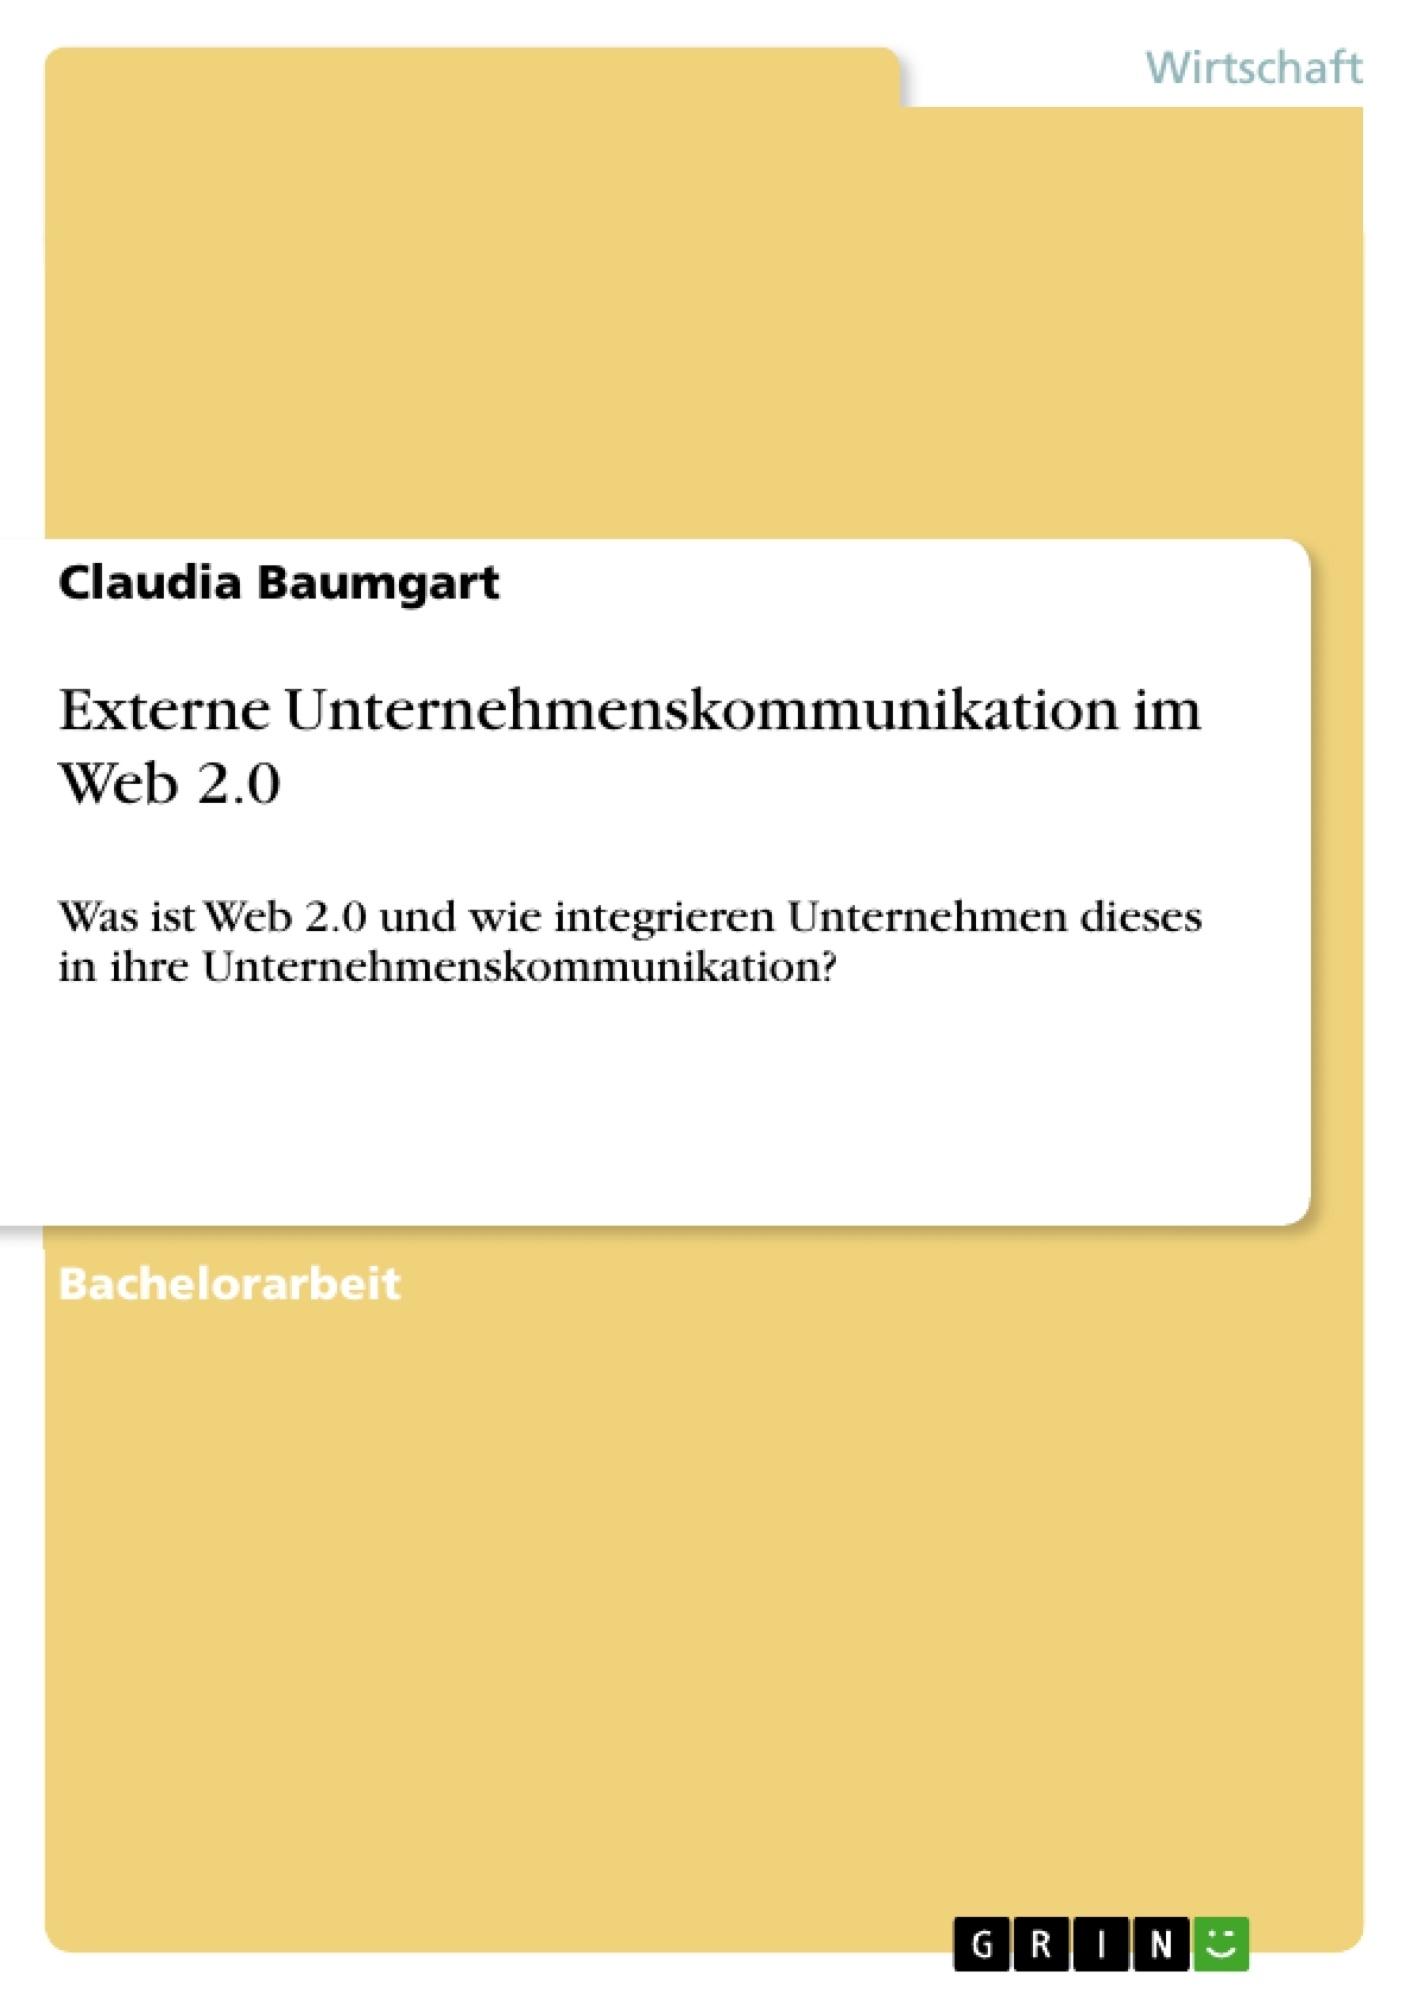 Titel: Externe Unternehmenskommunikation im Web 2.0